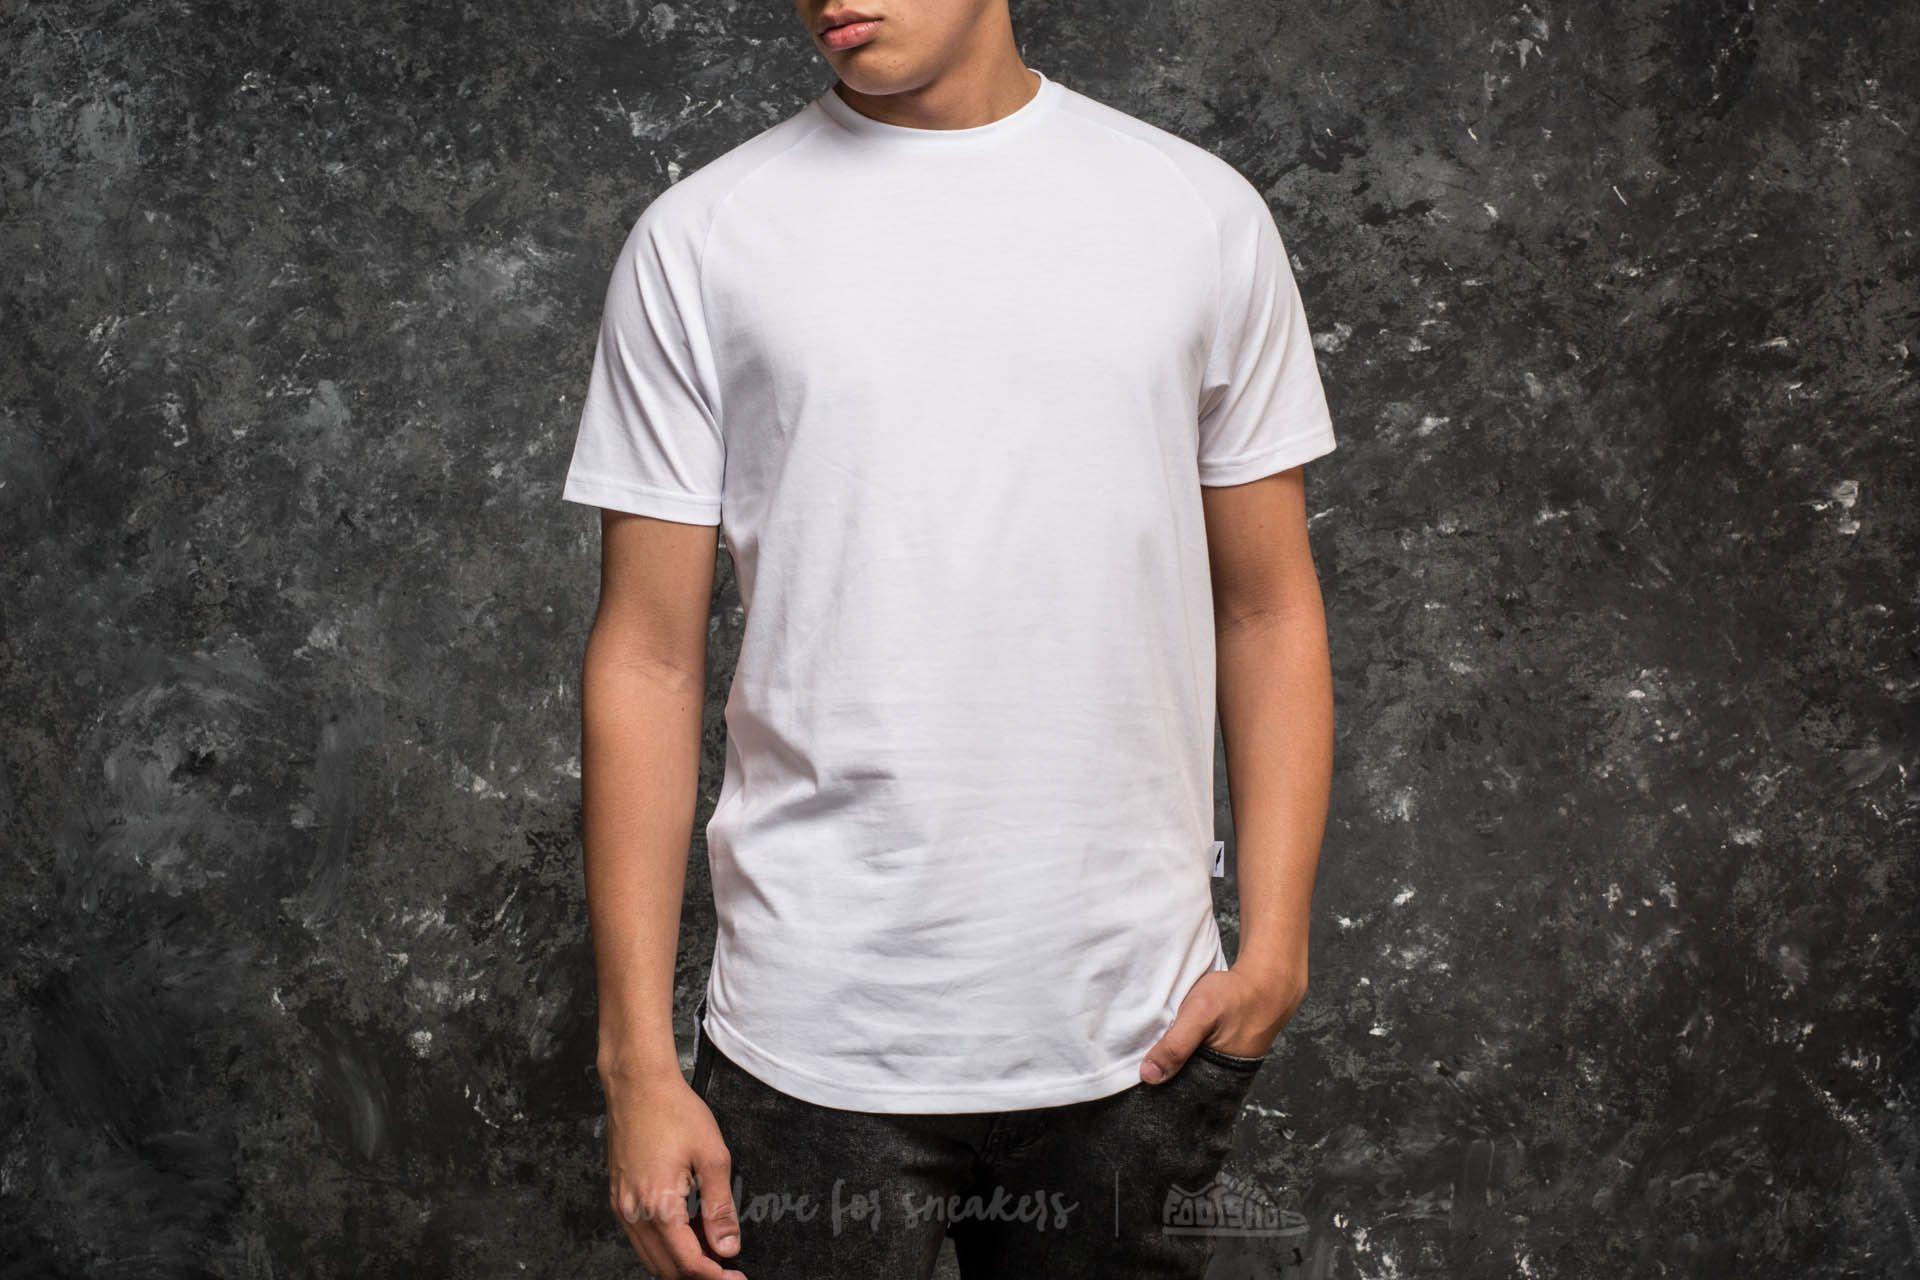 Publish Index Shortsleeve Raglan Knitted Tee White - 15156